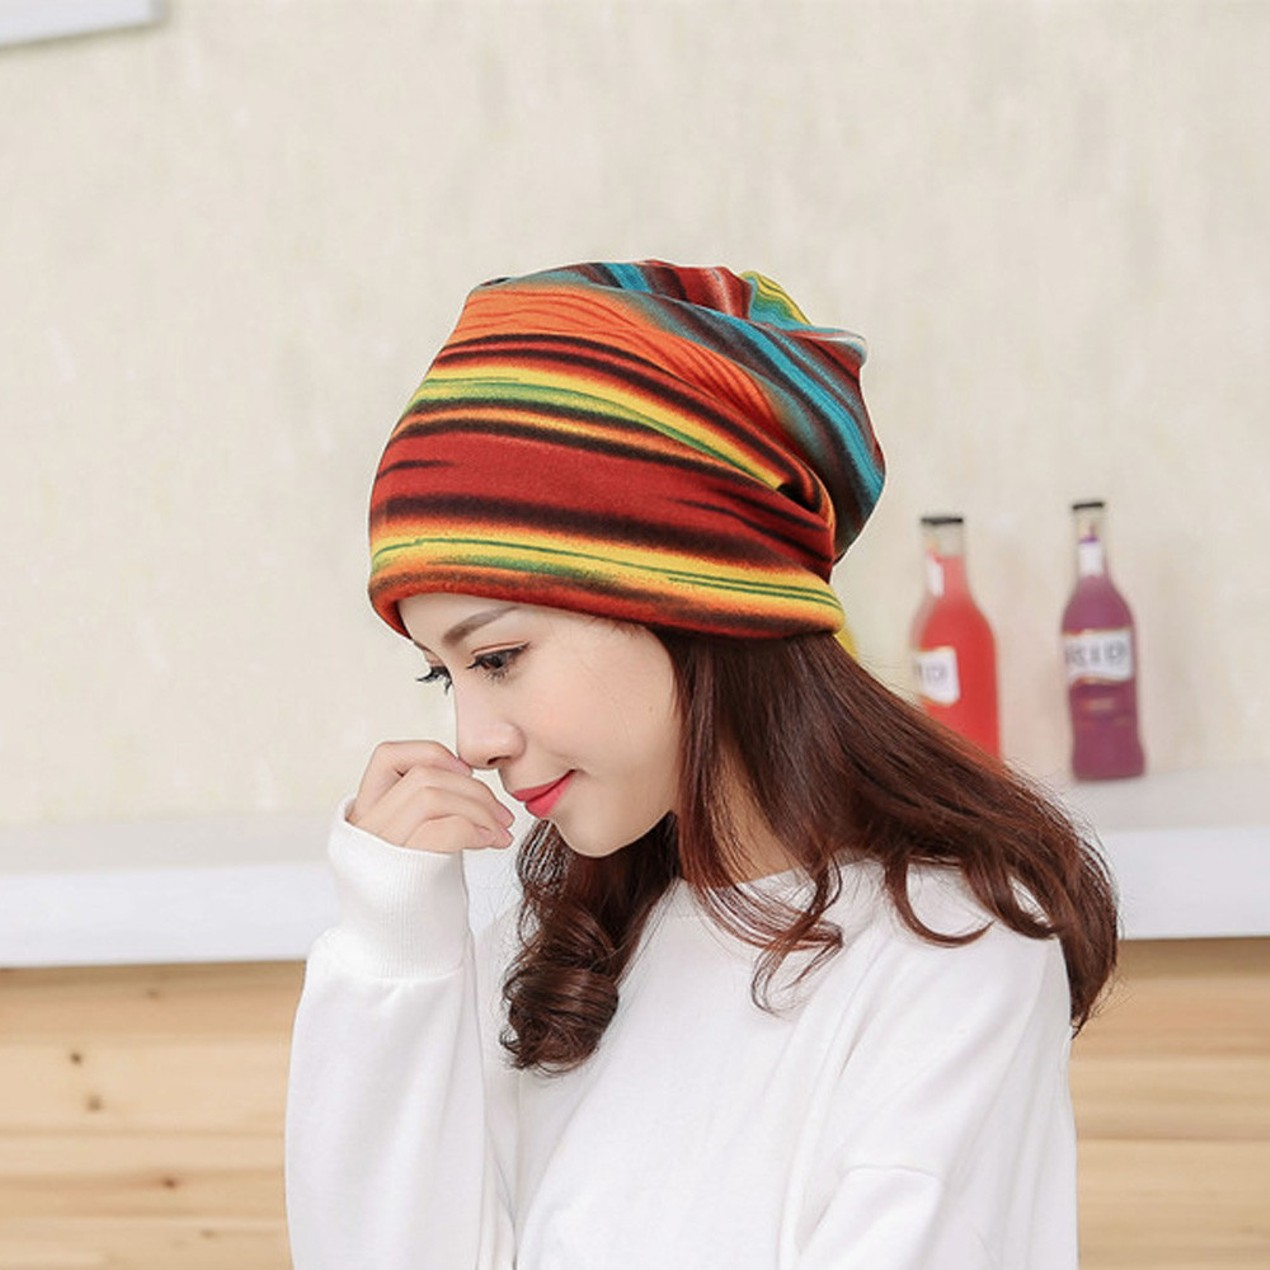 ... Women Hat Ruffle Cancer Hat Beanie Scarf Collar Turban Head Wrap Cap 7  ... 671dbd66b125